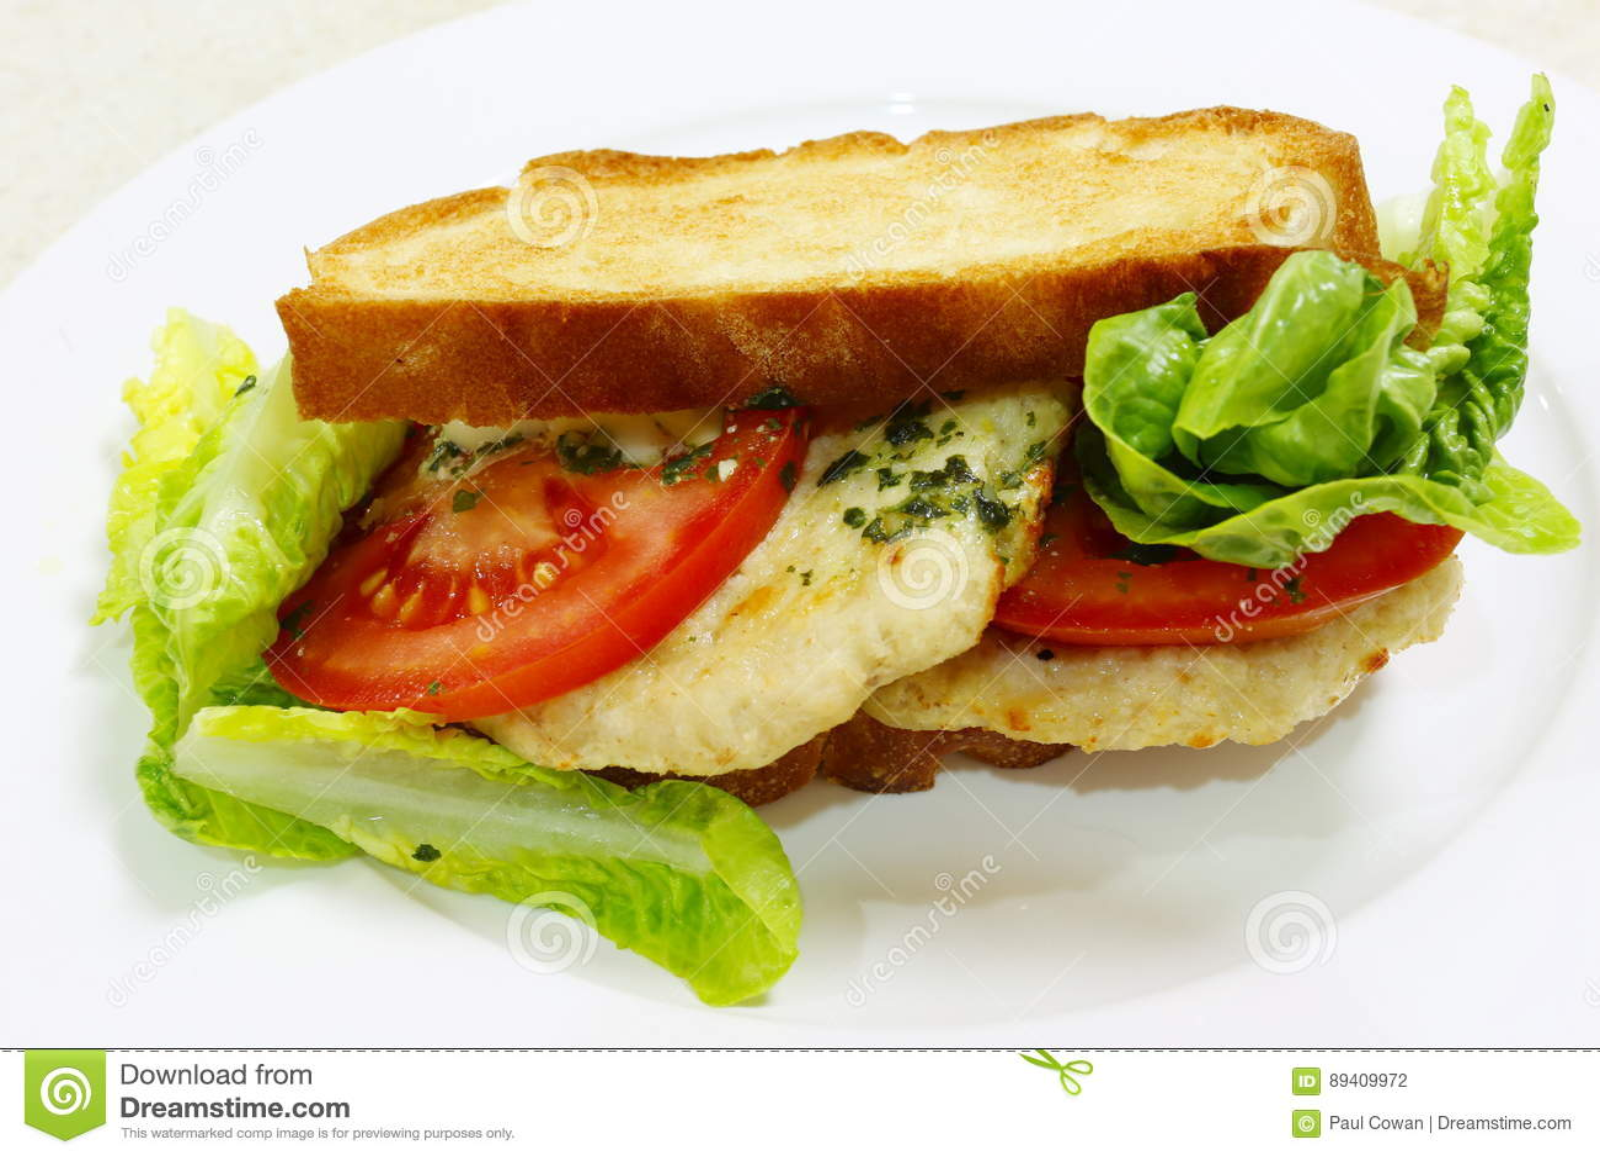 Cock meat sanwich